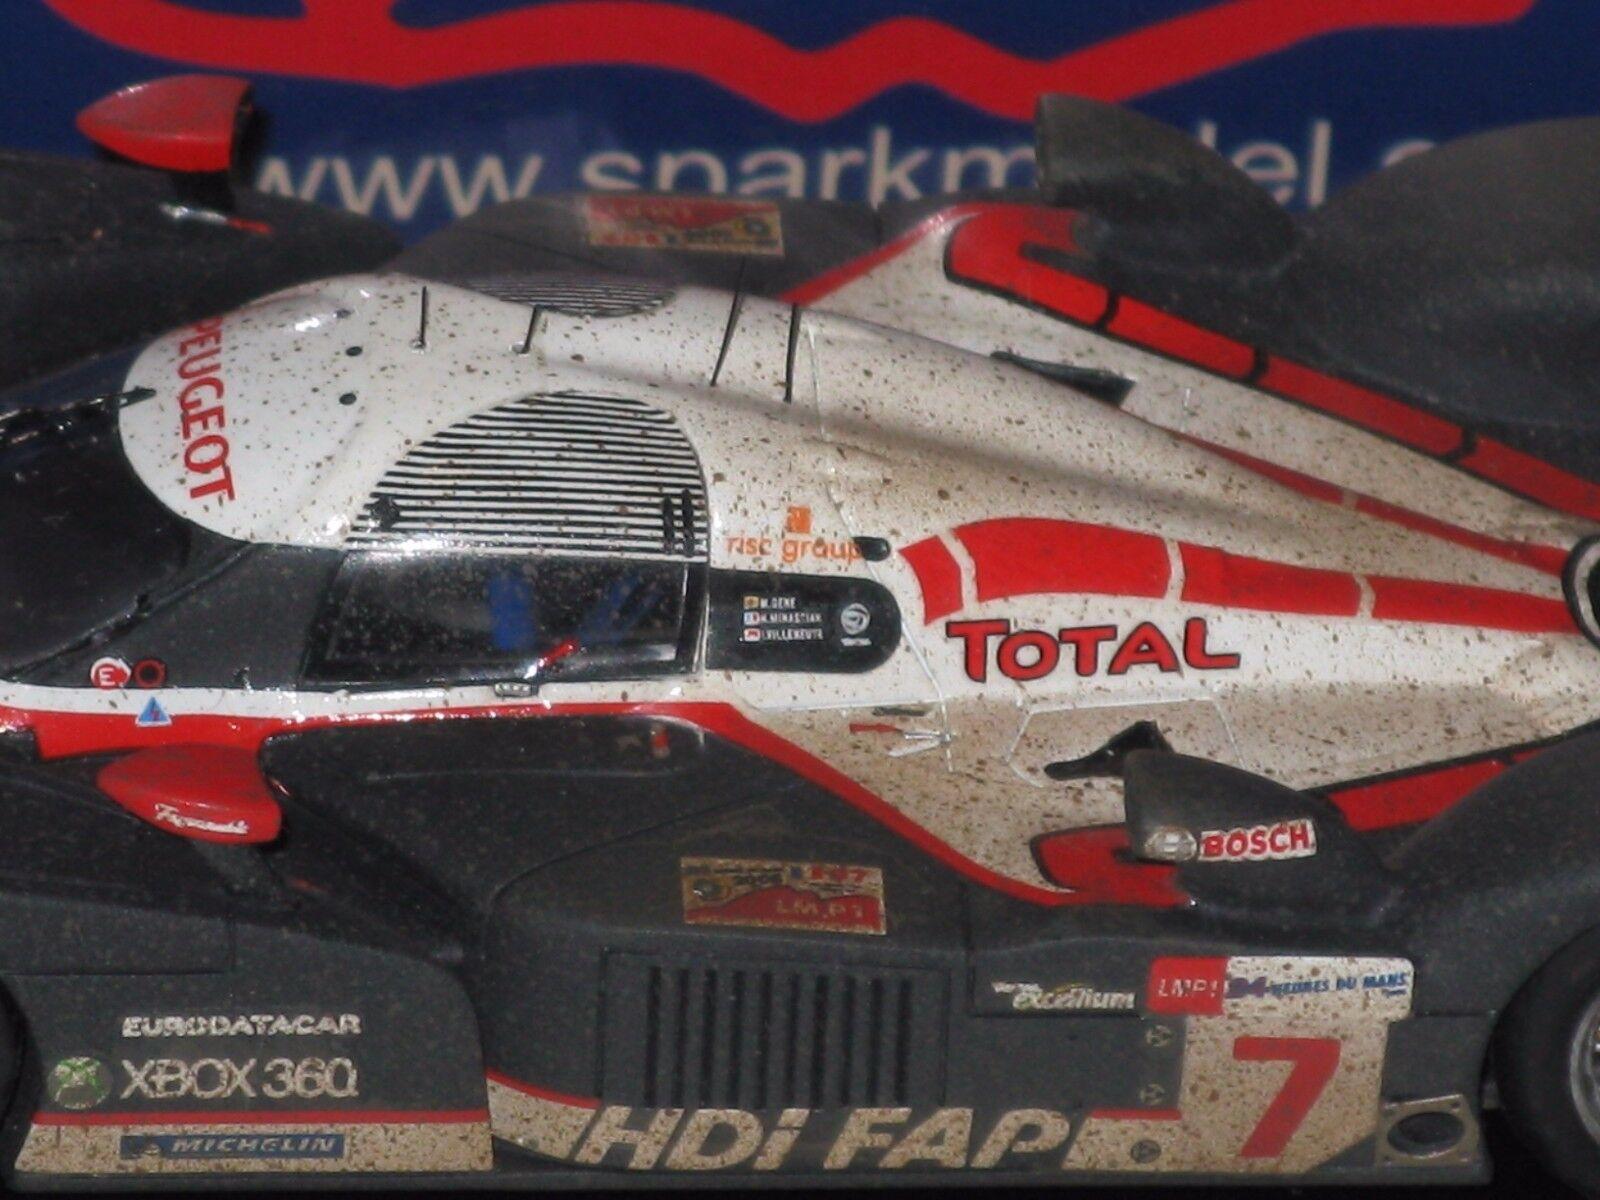 Peugeot Peugeot Peugeot 908 LM 2008 -Villeneuve - Gene - Le Mans  Dirty model - 1 43 F1  spark 118624